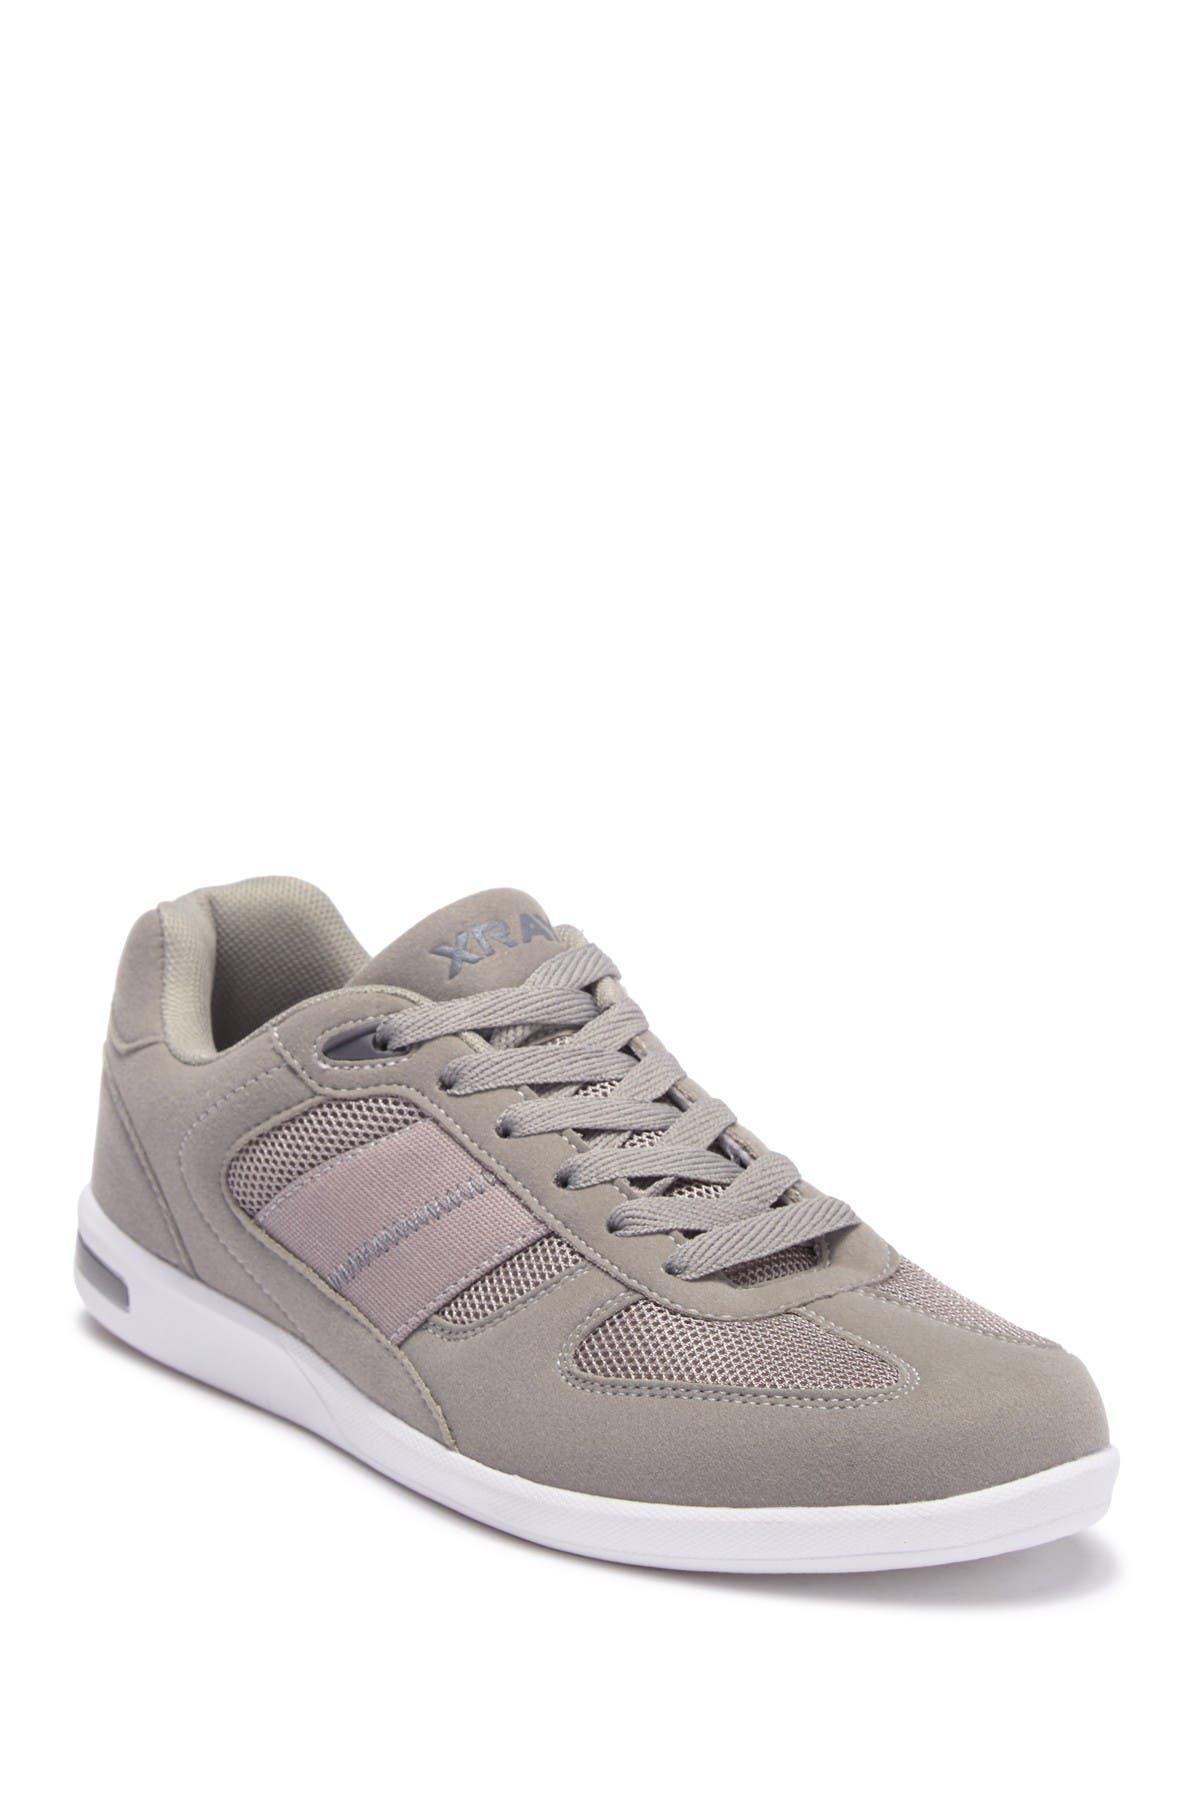 Image of XRAY Perlman Low Top Sneaker